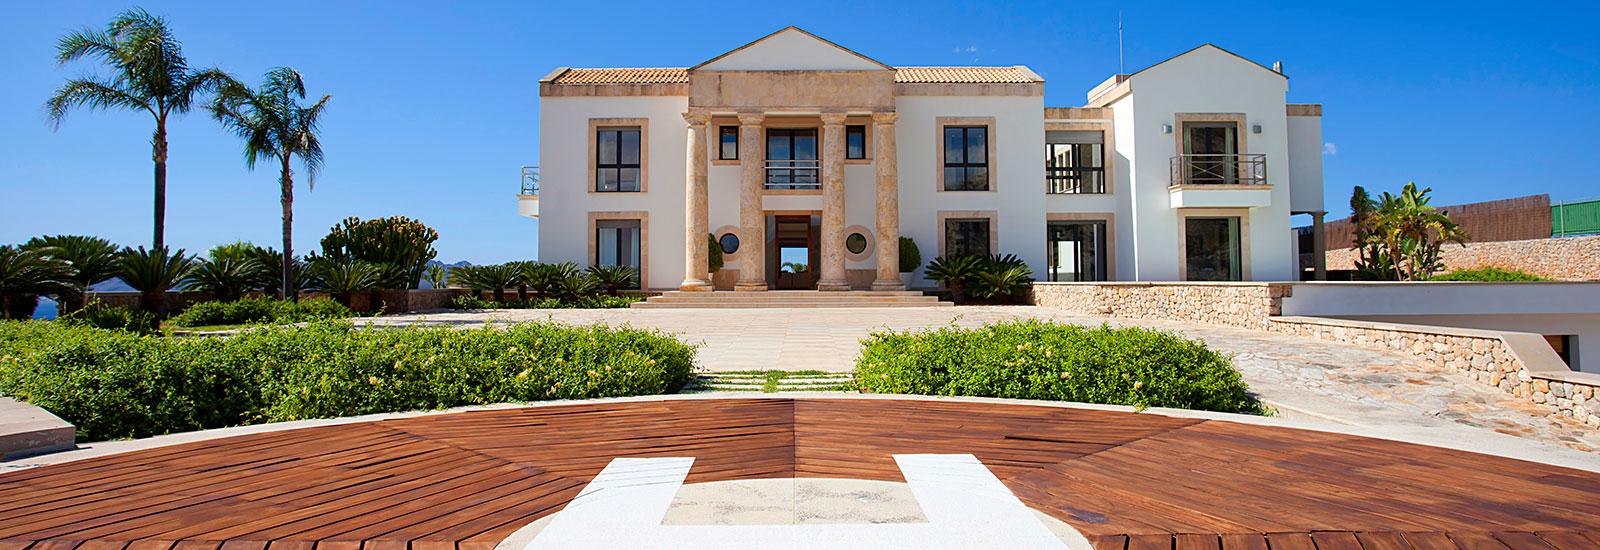 Luxus Finca Mallorca mieten: Villa, Ferienhaus, Ferienwohnung